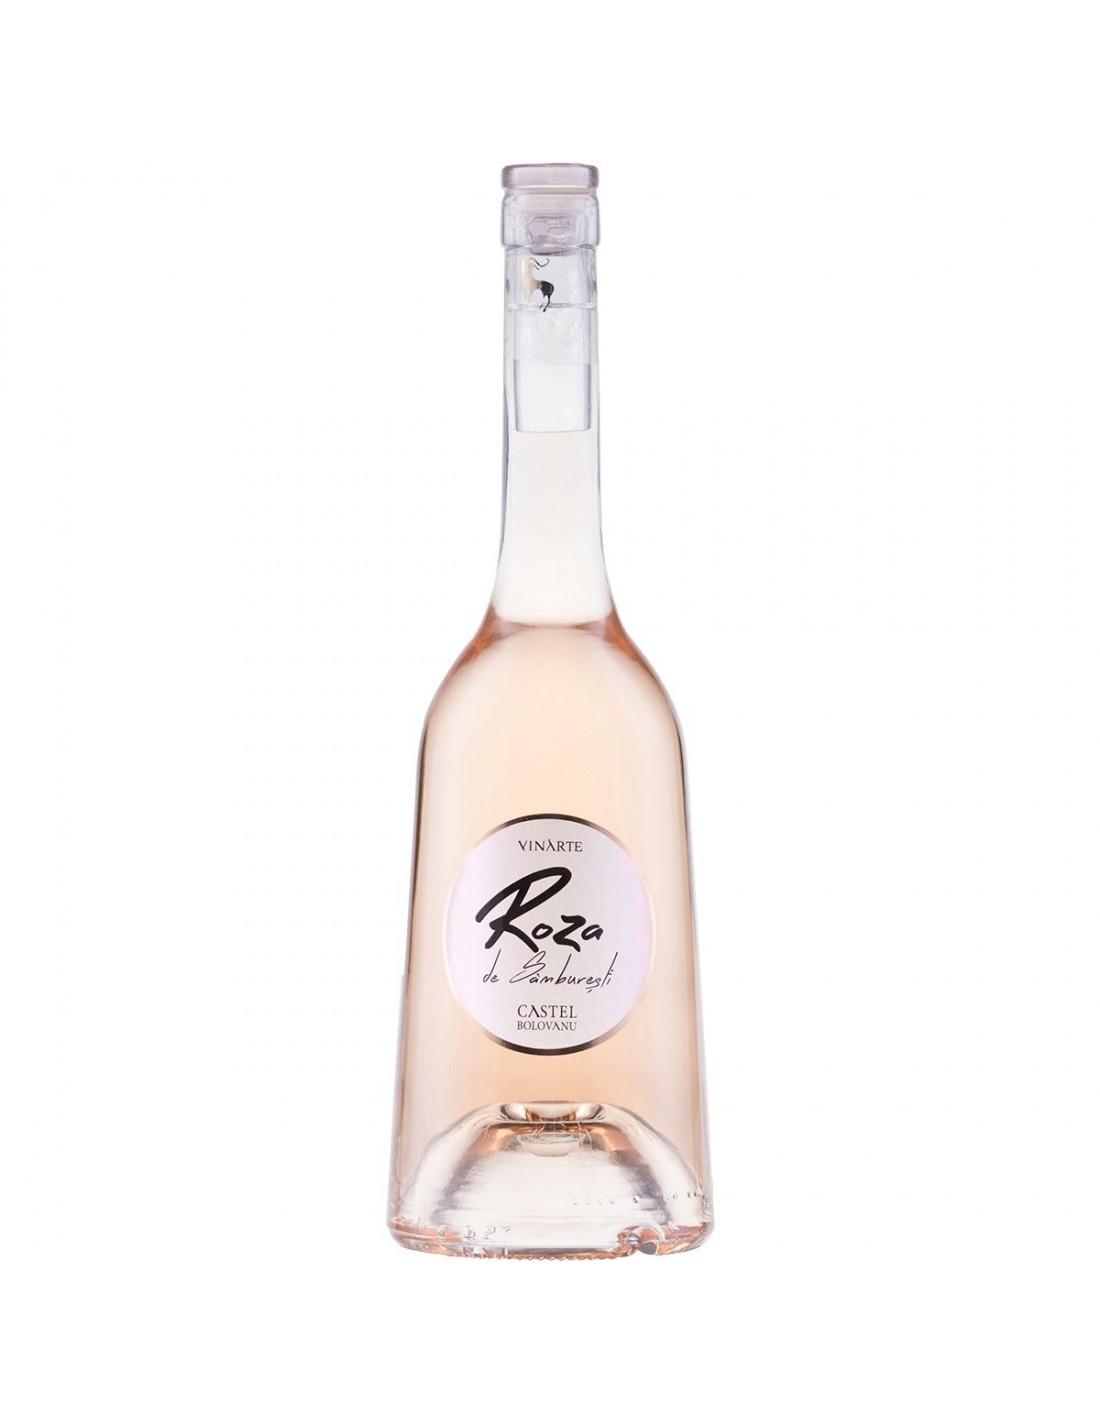 Vin roze sec, Roza de Samburesti, Cabernet Sauvignon, 12.5% alc., 0.75L